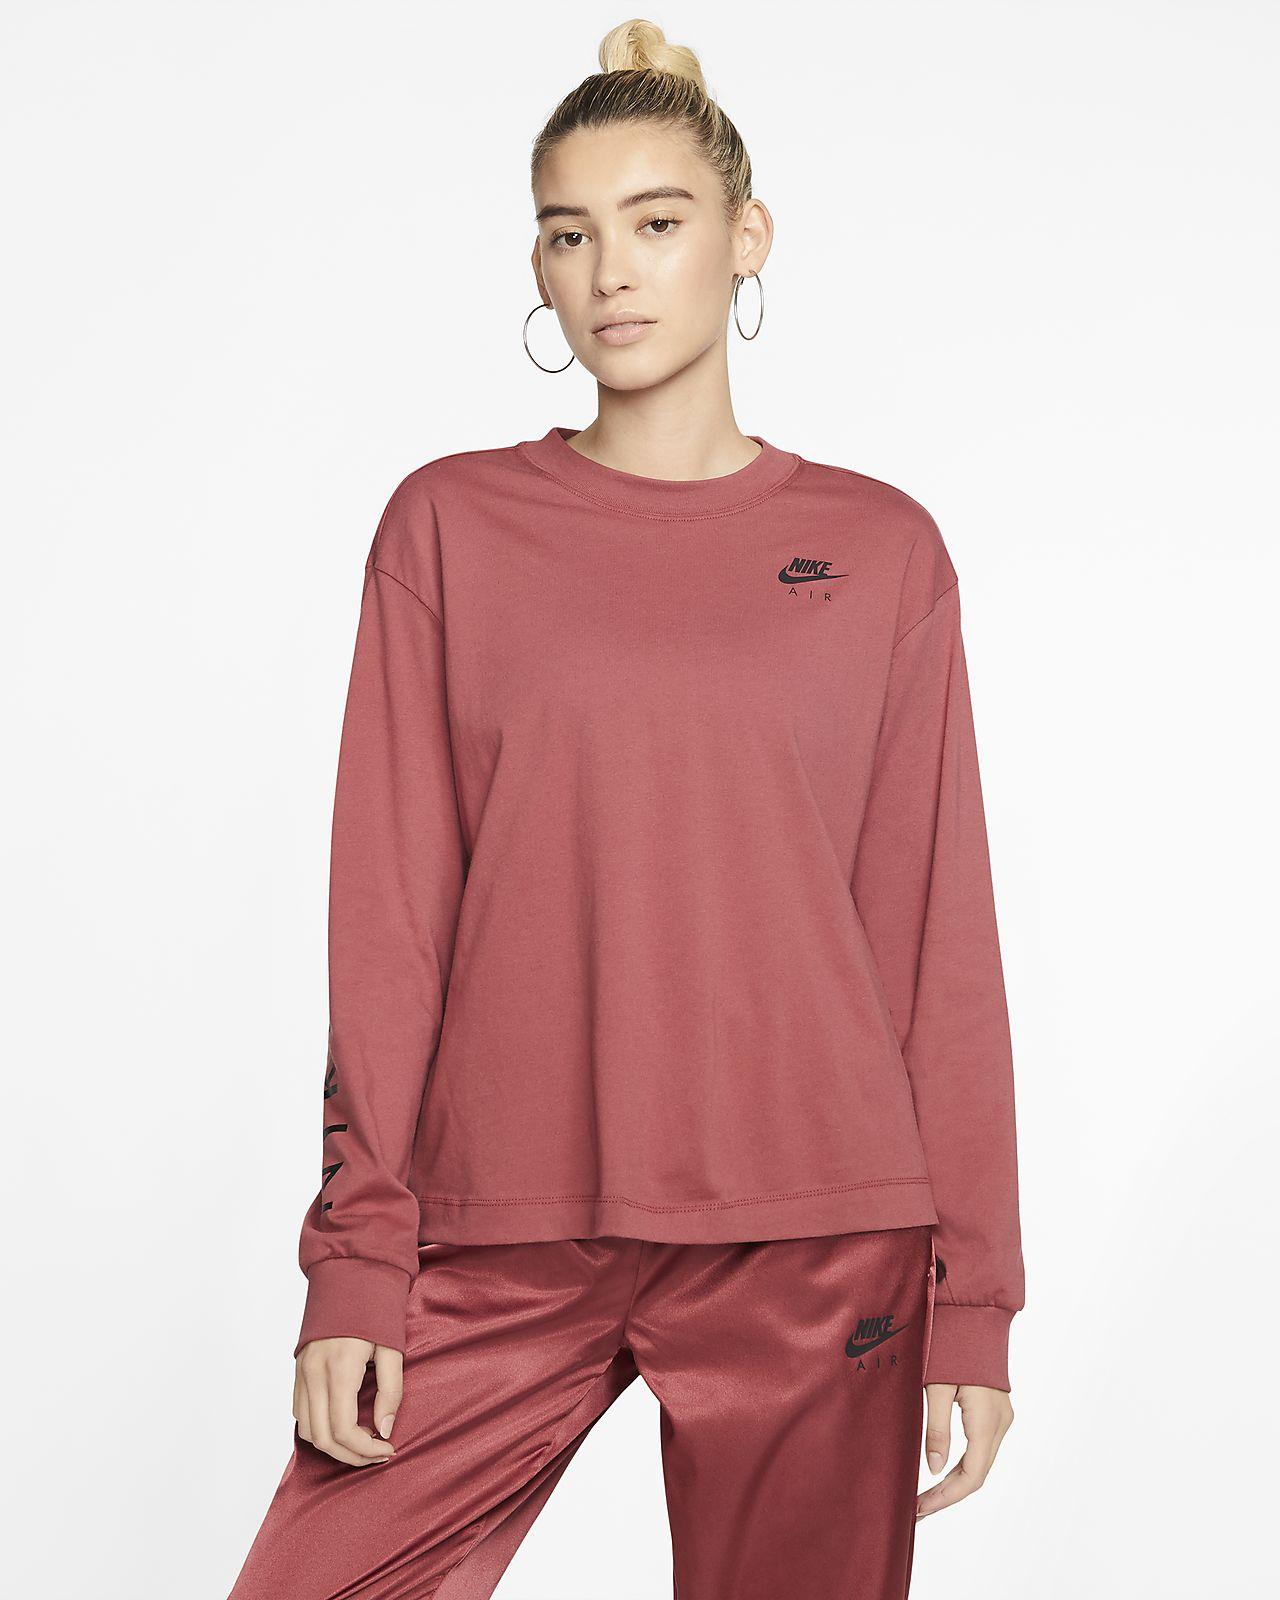 Nike Air langærmet top til kvinder. Nike DK